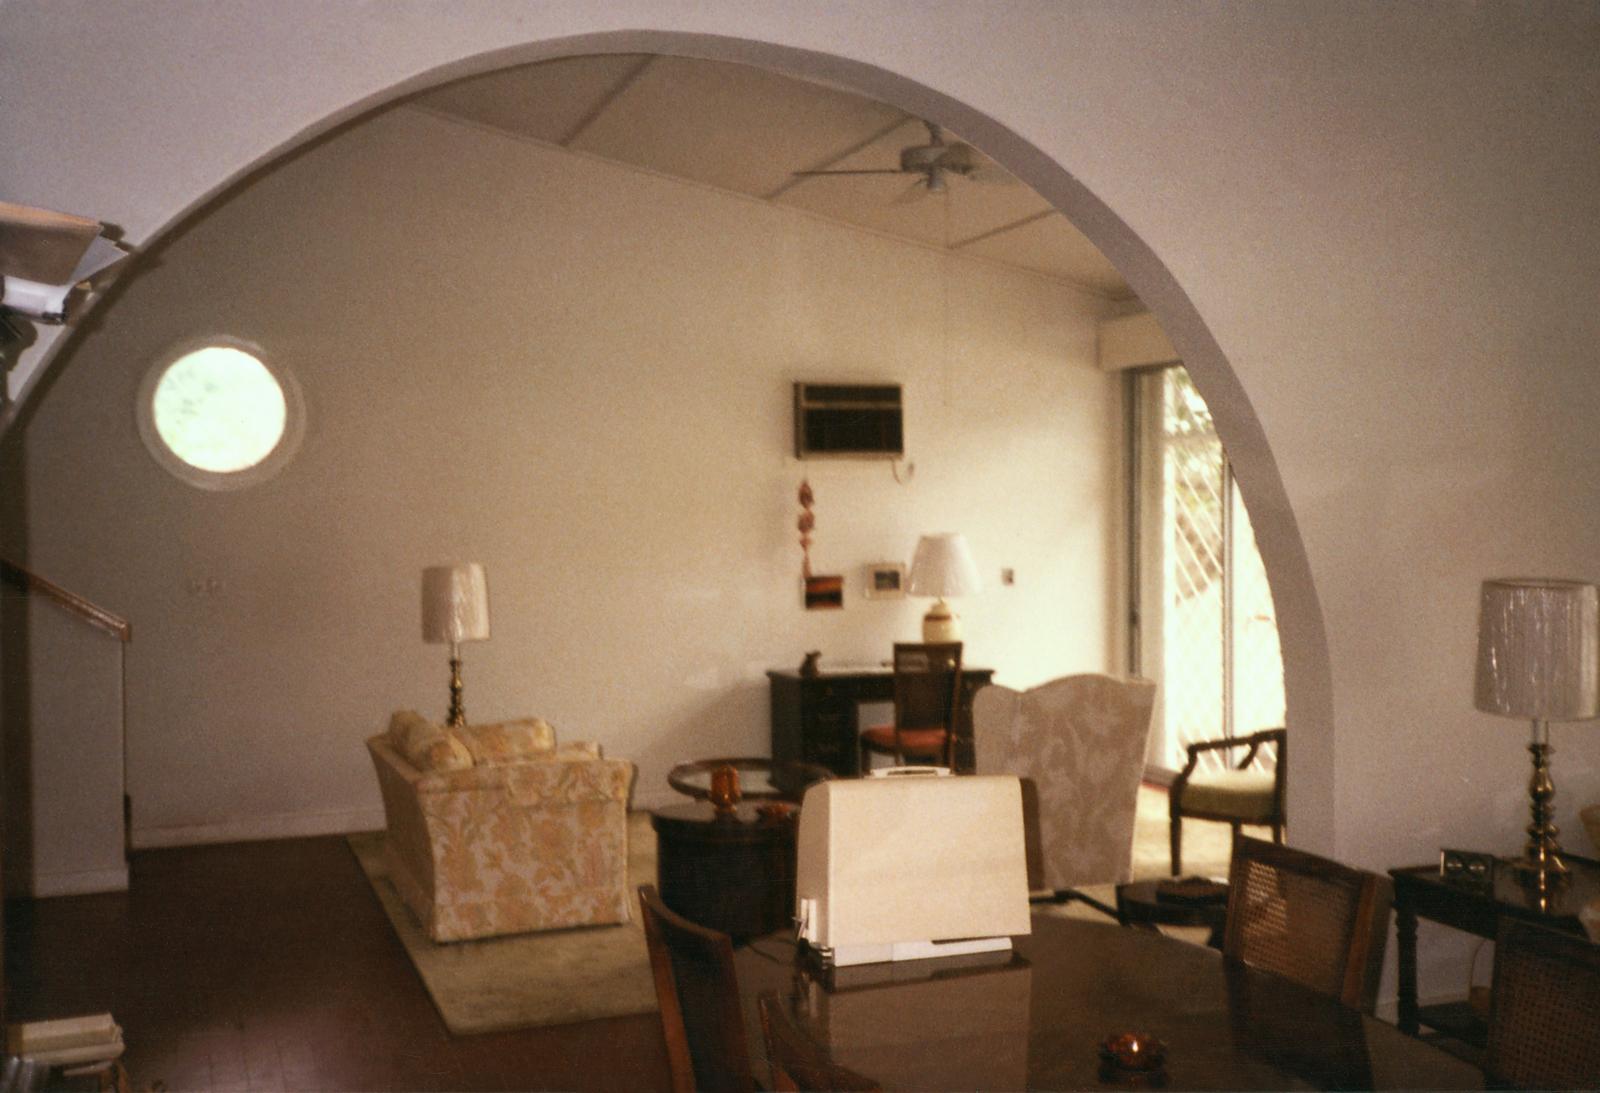 Brazzaville - Multi-Unit Residential Building - 1984